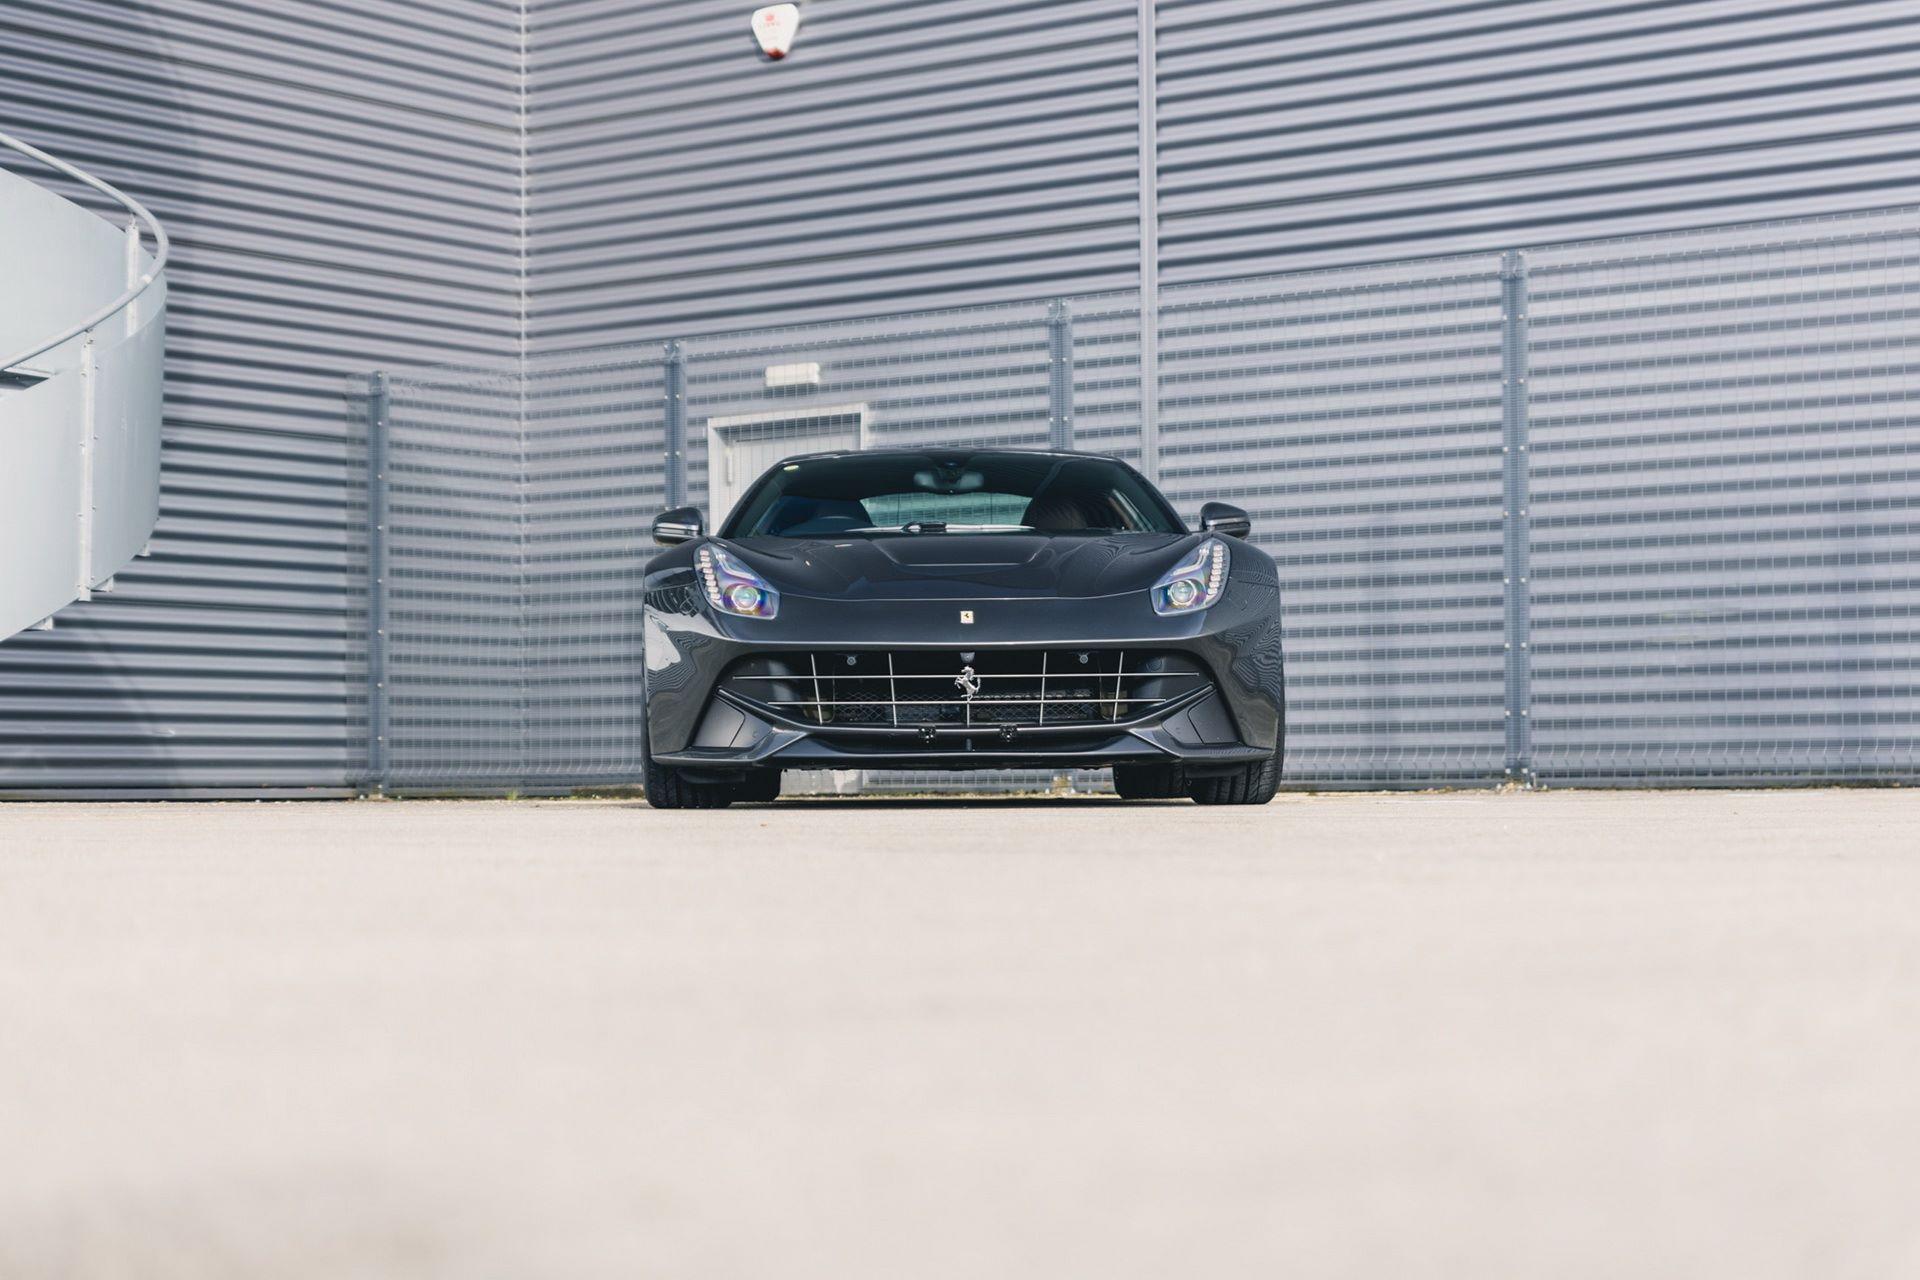 Ferrari-F12berlinetta-Chris-Harris-2